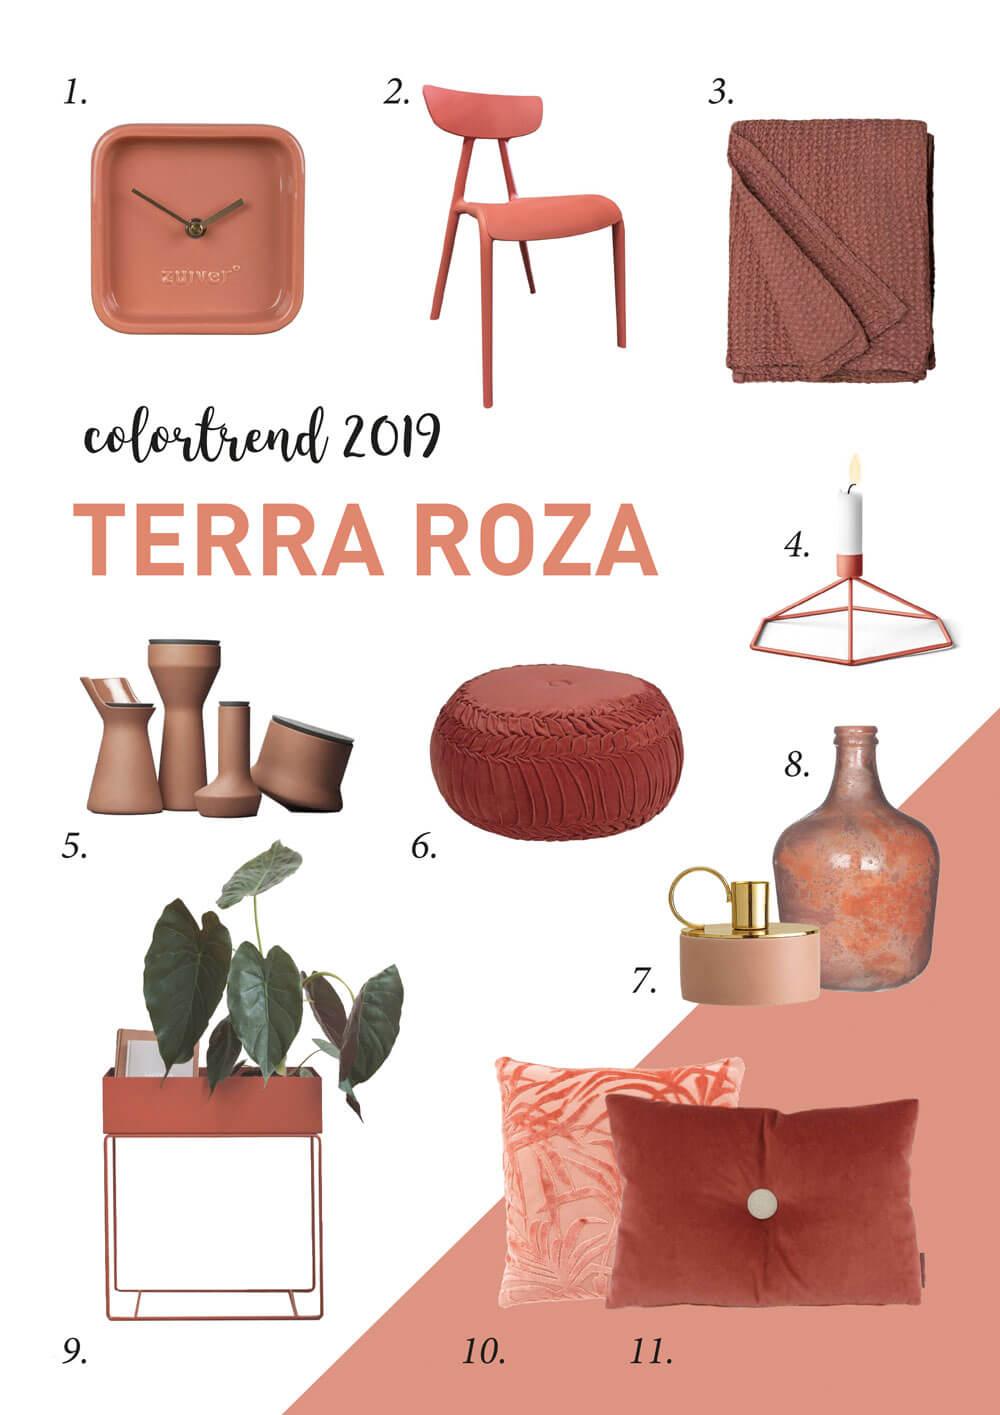 trendkleur 2019 shoppen 11 woonproducten in terra roza een warme roze kleurtrend